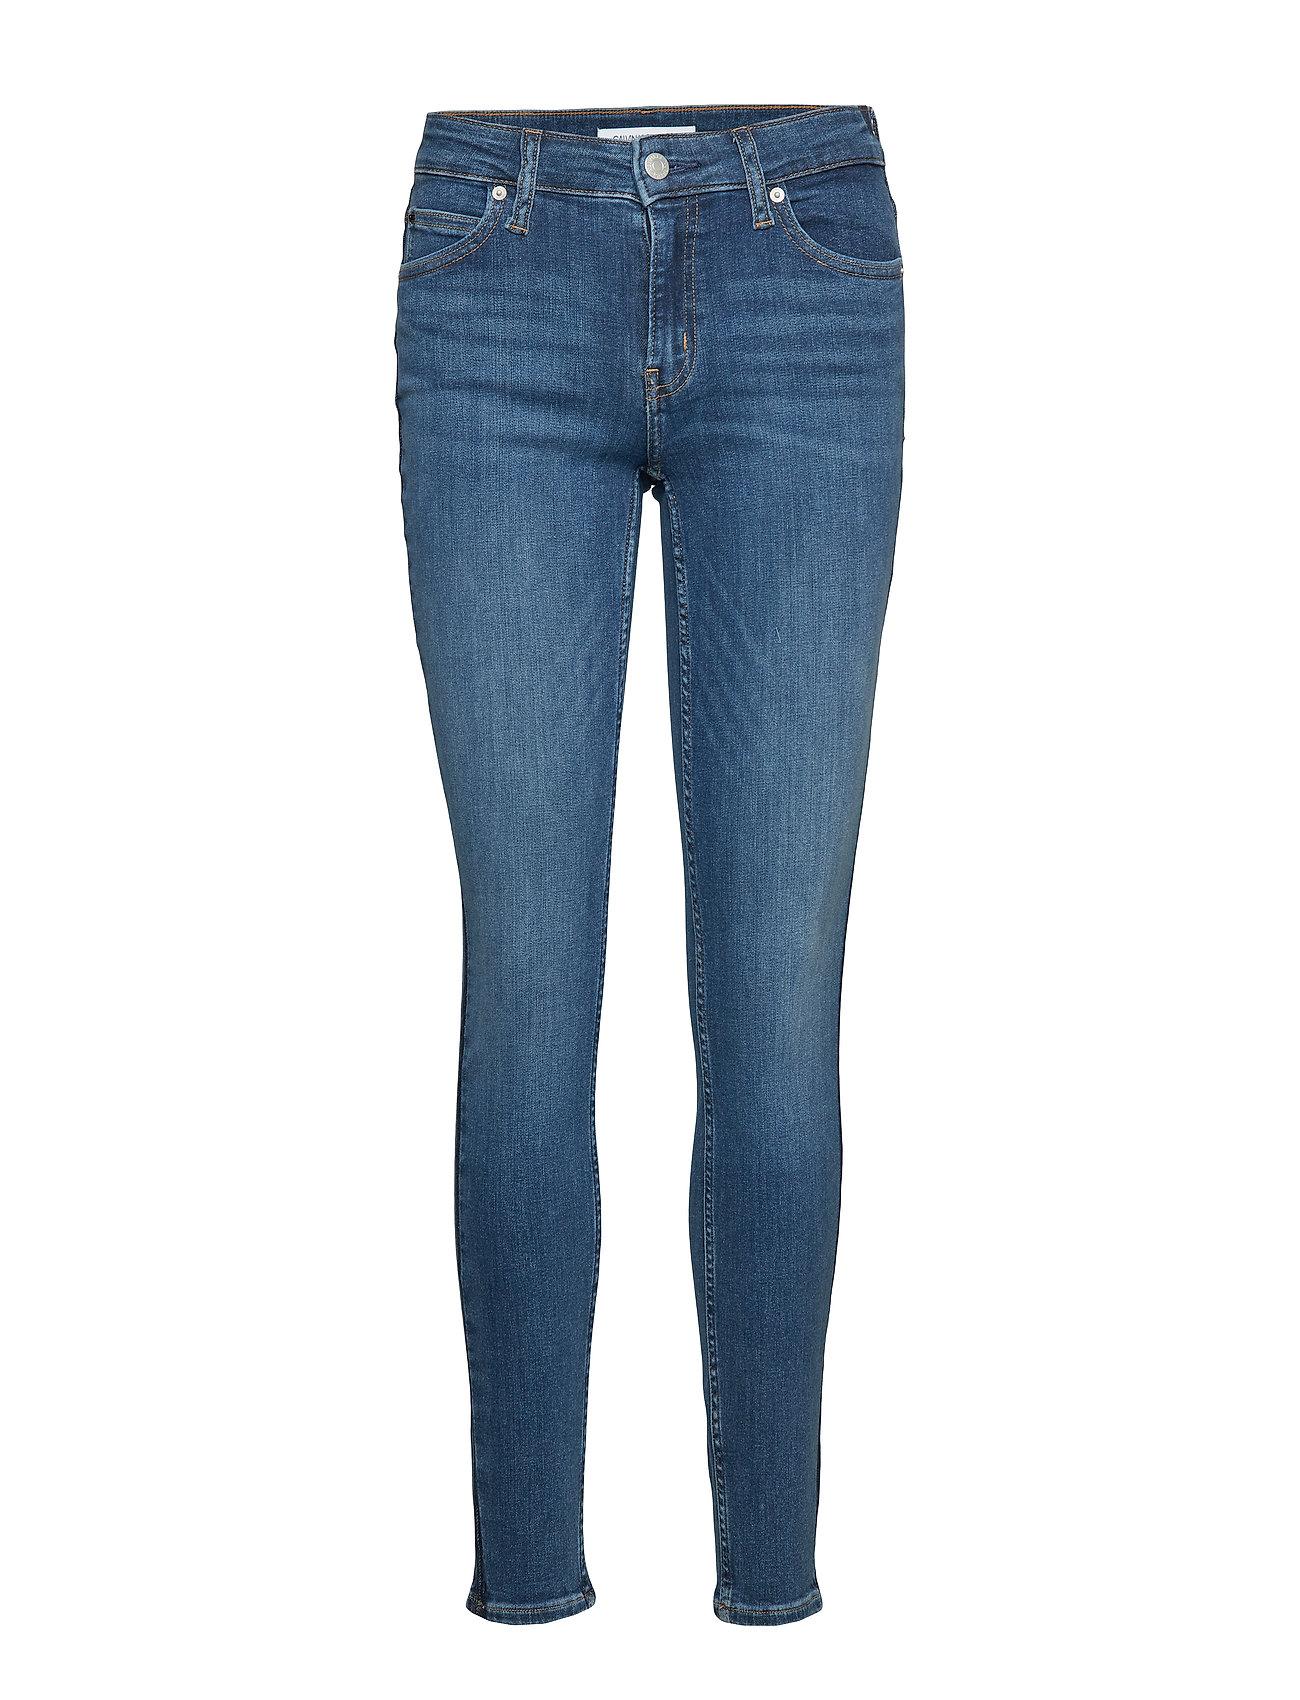 Calvin Klein Jeans CKJ 011 MID RISE SKI - TARONGA BLUE SIDE STRIPE